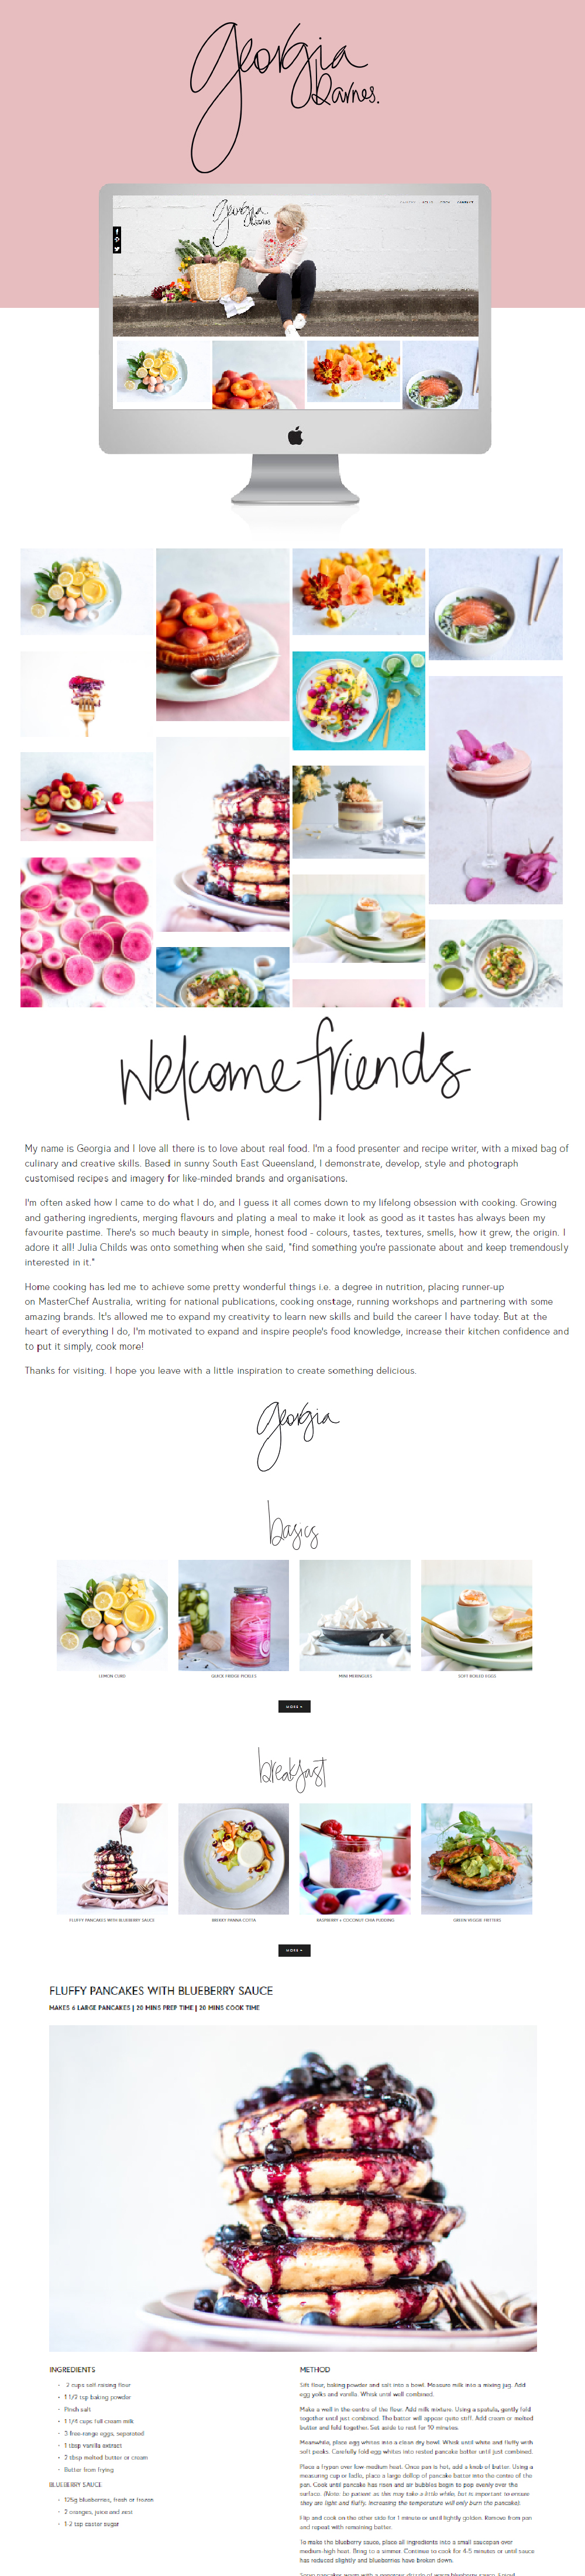 Georgia Barnes Website.jpg